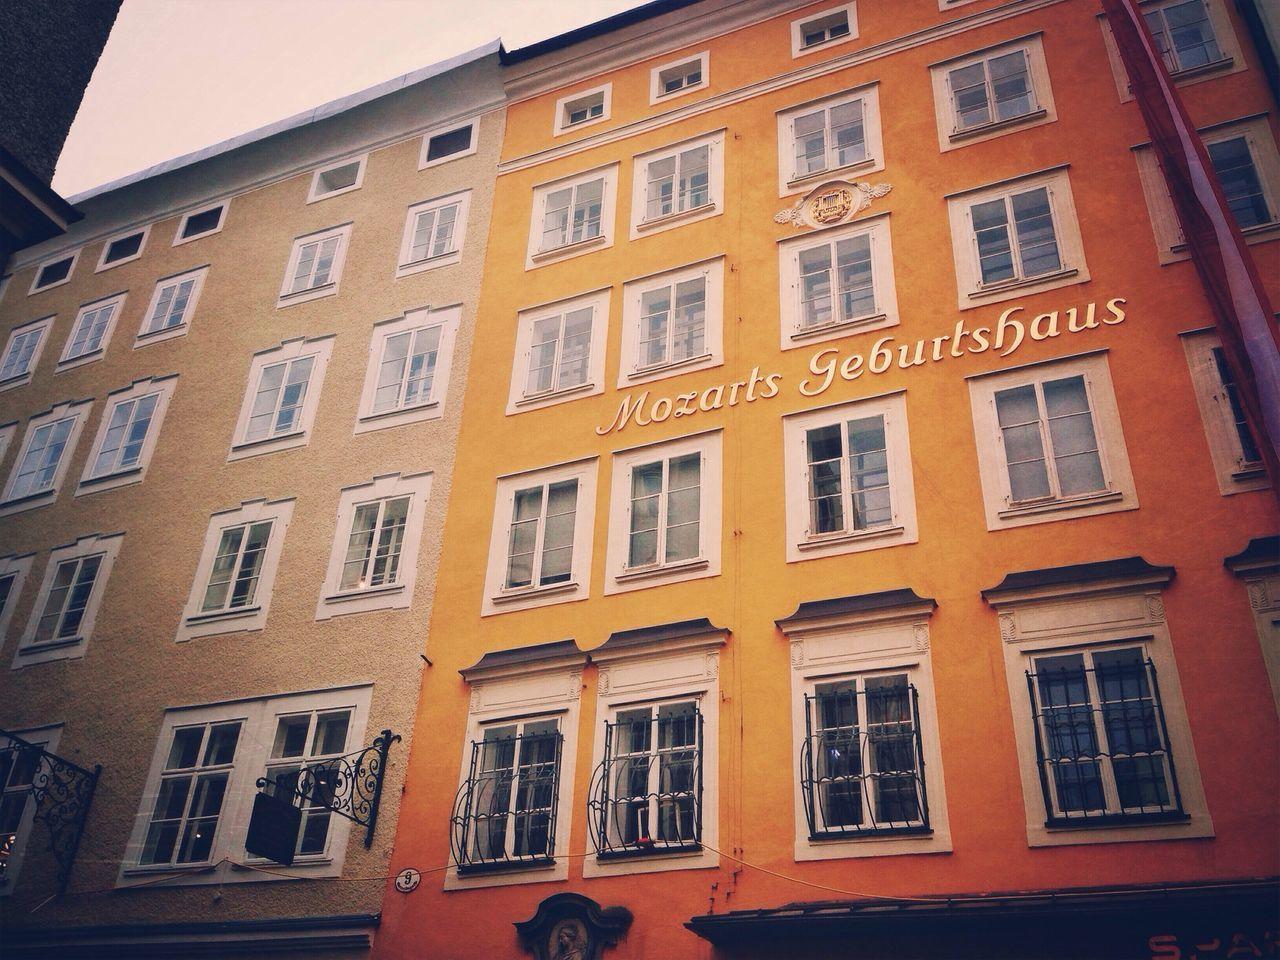 Salzburg MozartGeburthaus